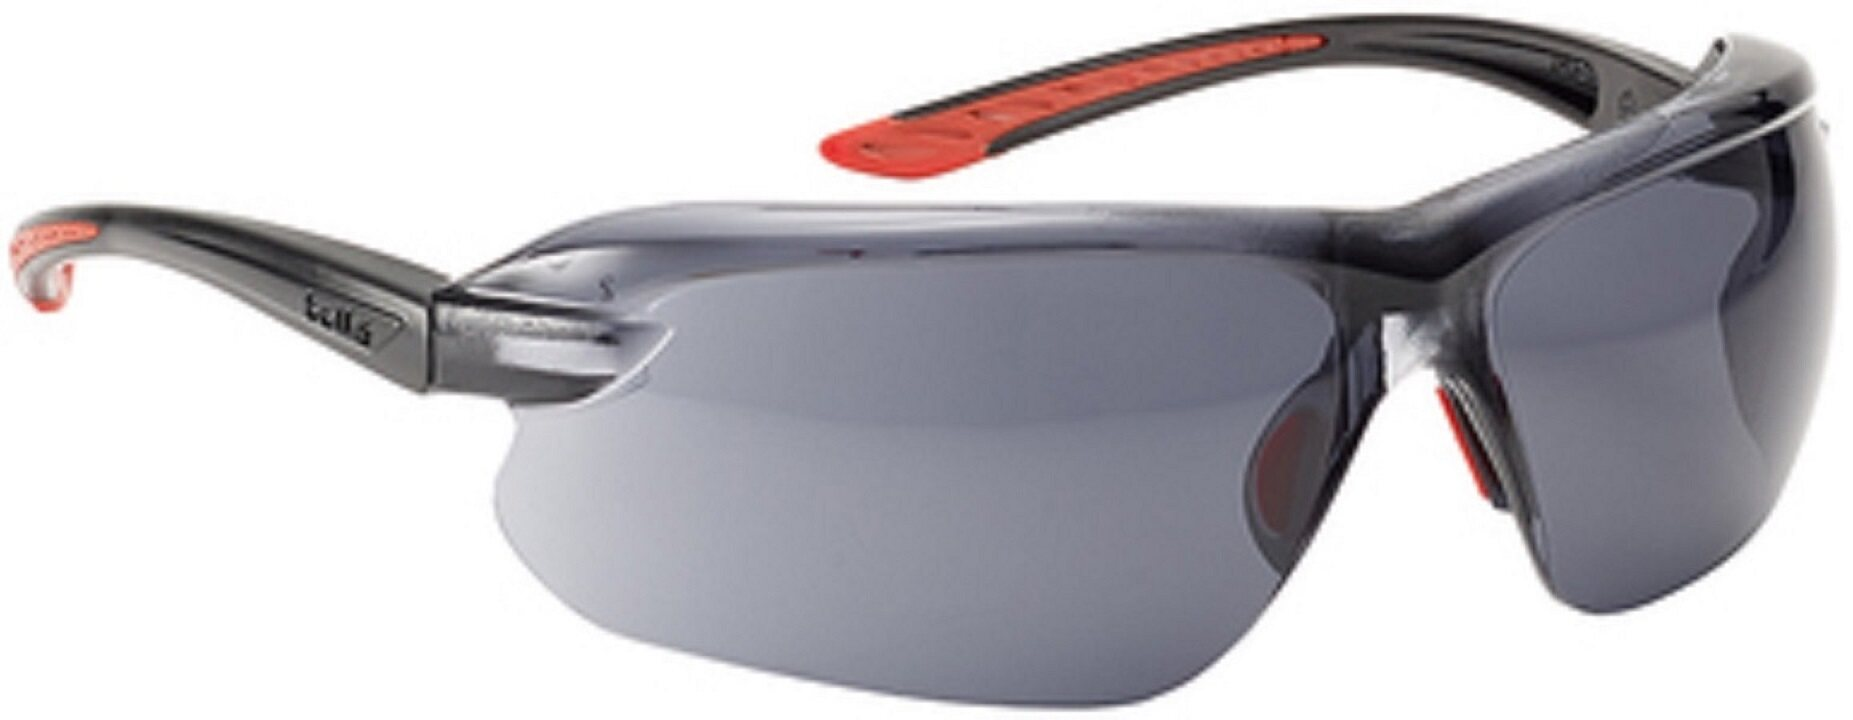 Kaca Mata 100% UV400 Protection (Bolle IRI-S)-Asap-Intl